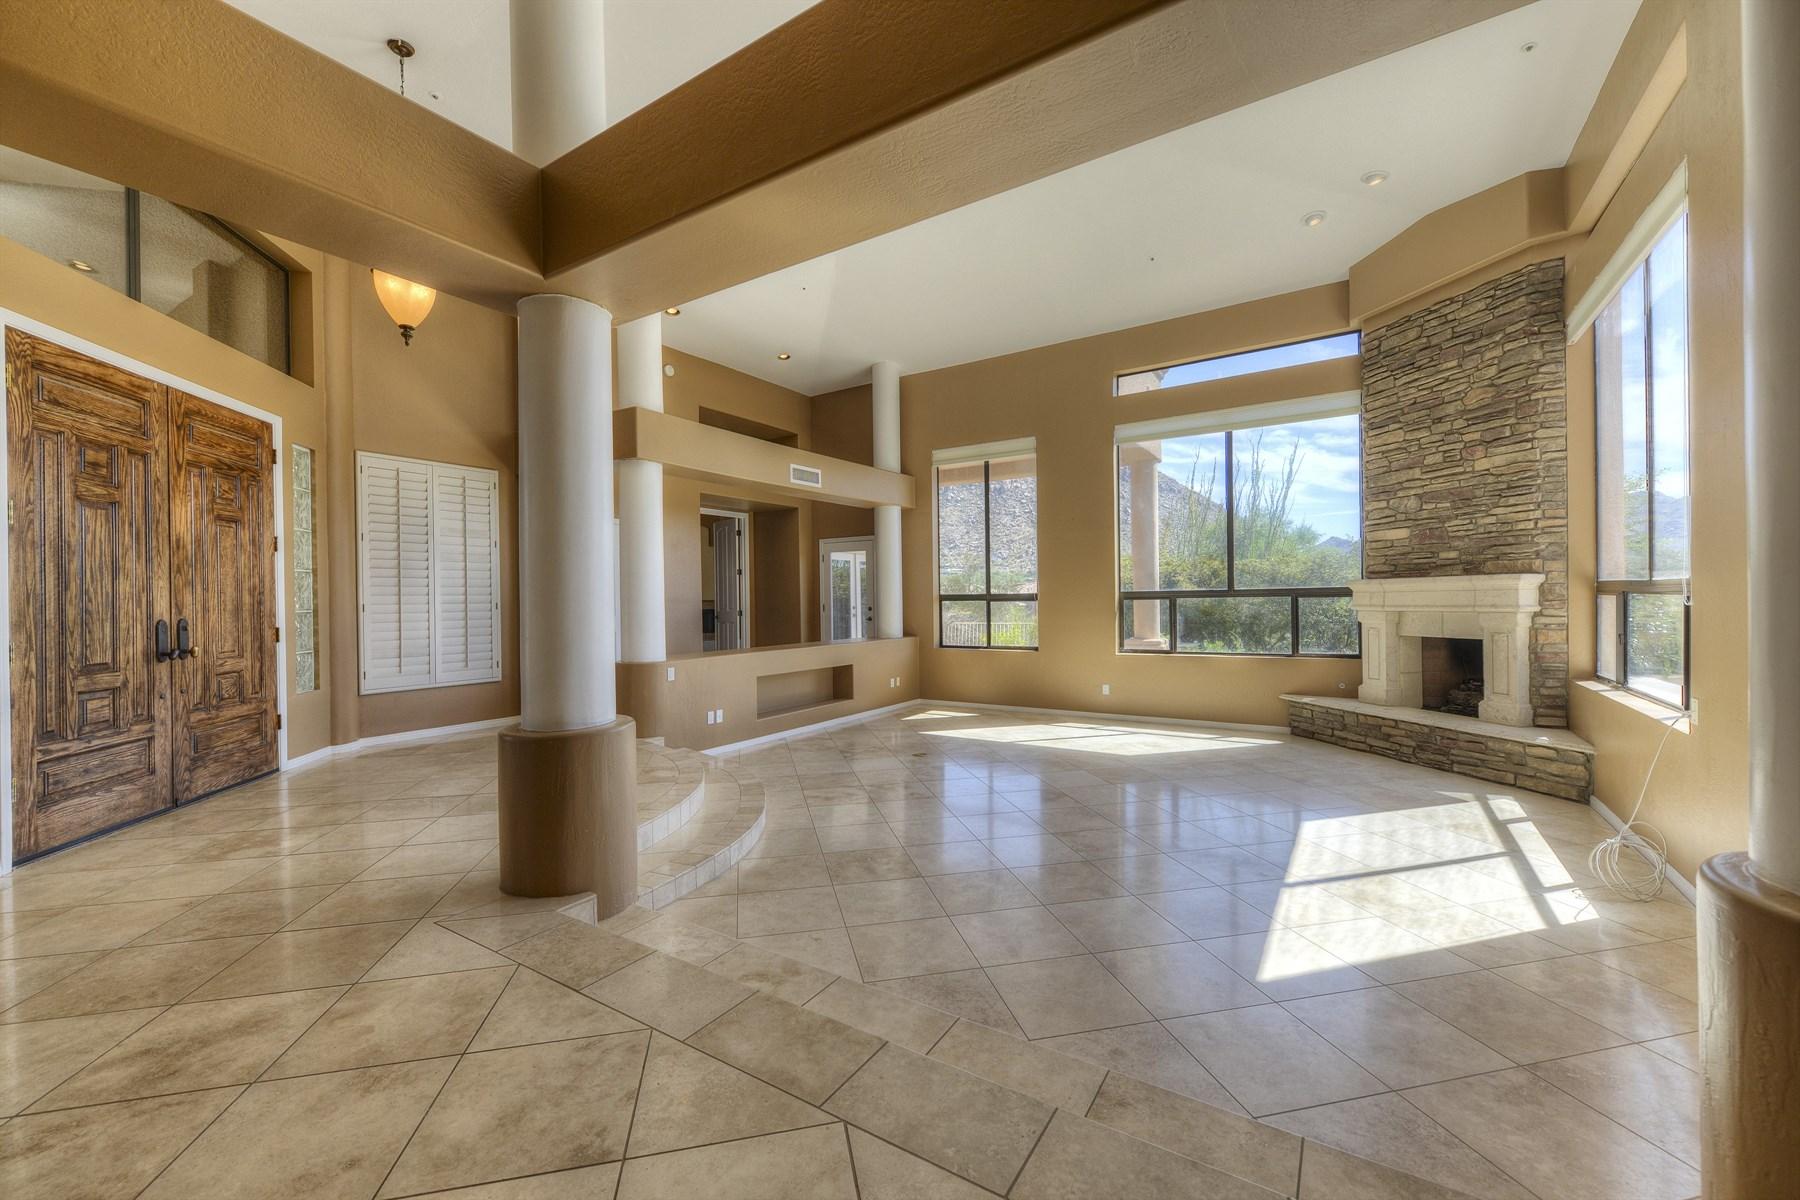 Частный односемейный дом для того Продажа на tunning Views of Troon Mountain and the McDowell's 25630 N 104th Way Scottsdale, Аризона 85255 Соединенные Штаты